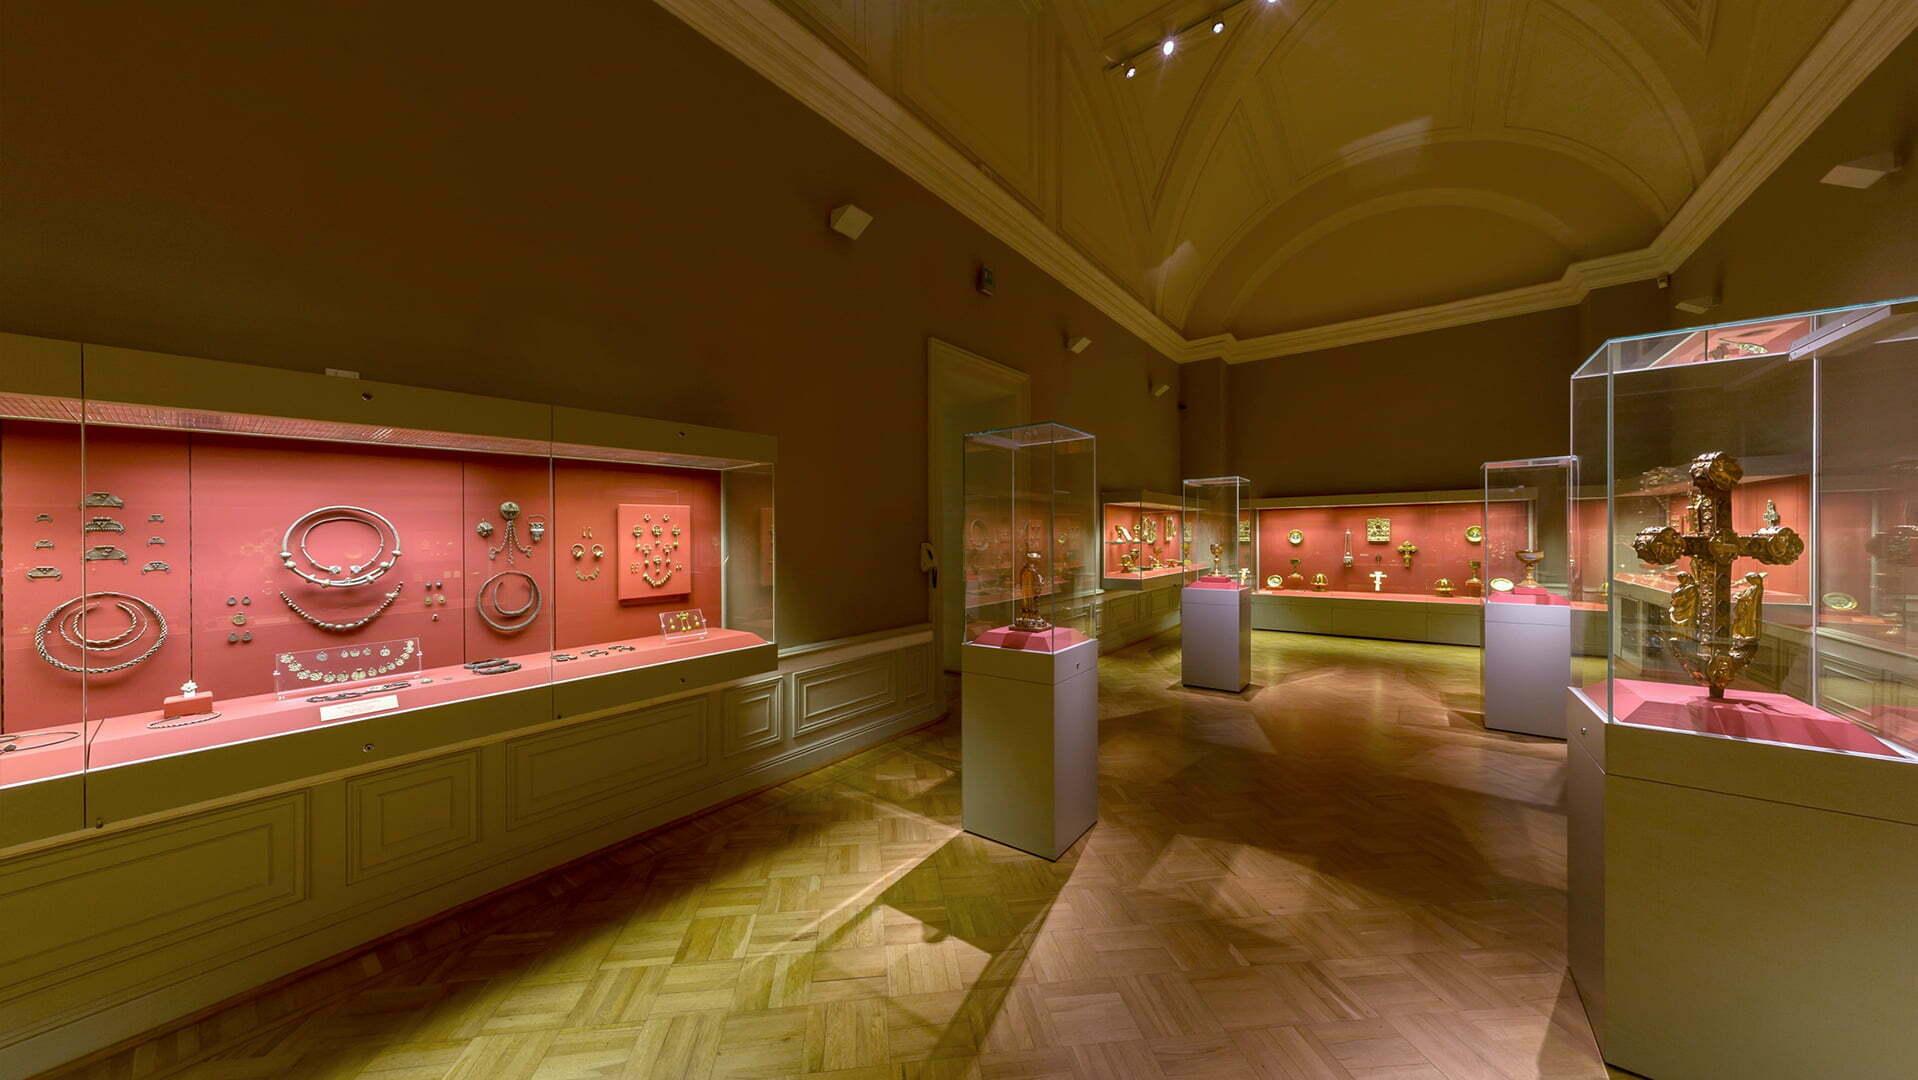 Общий вид залов Бриллиантовй кладовой Эрмитажа